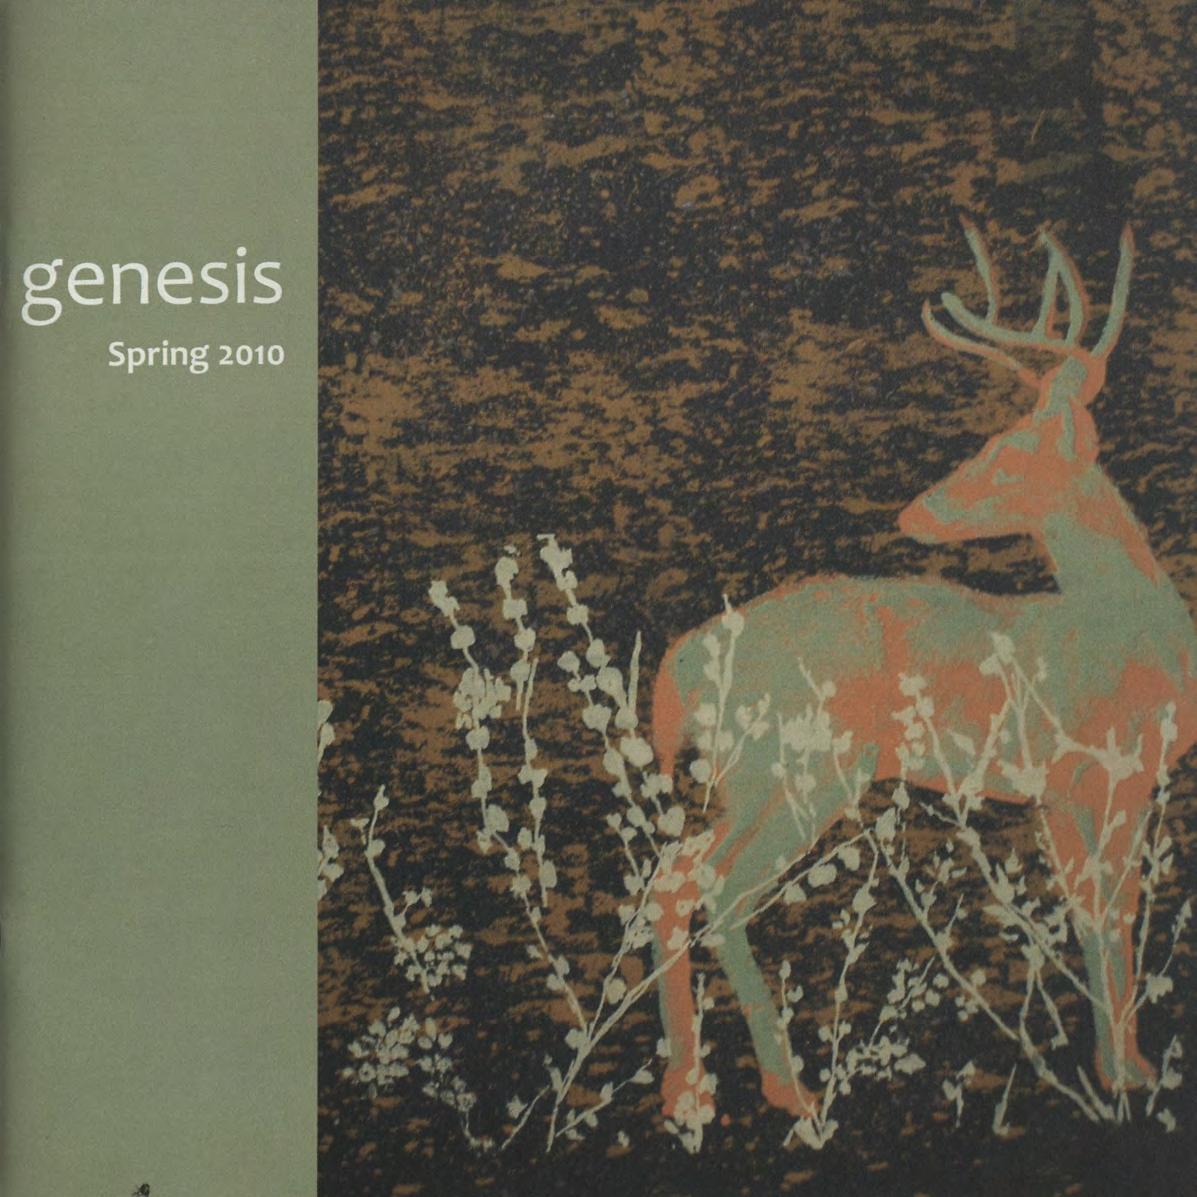 genesis spring 2010 cover